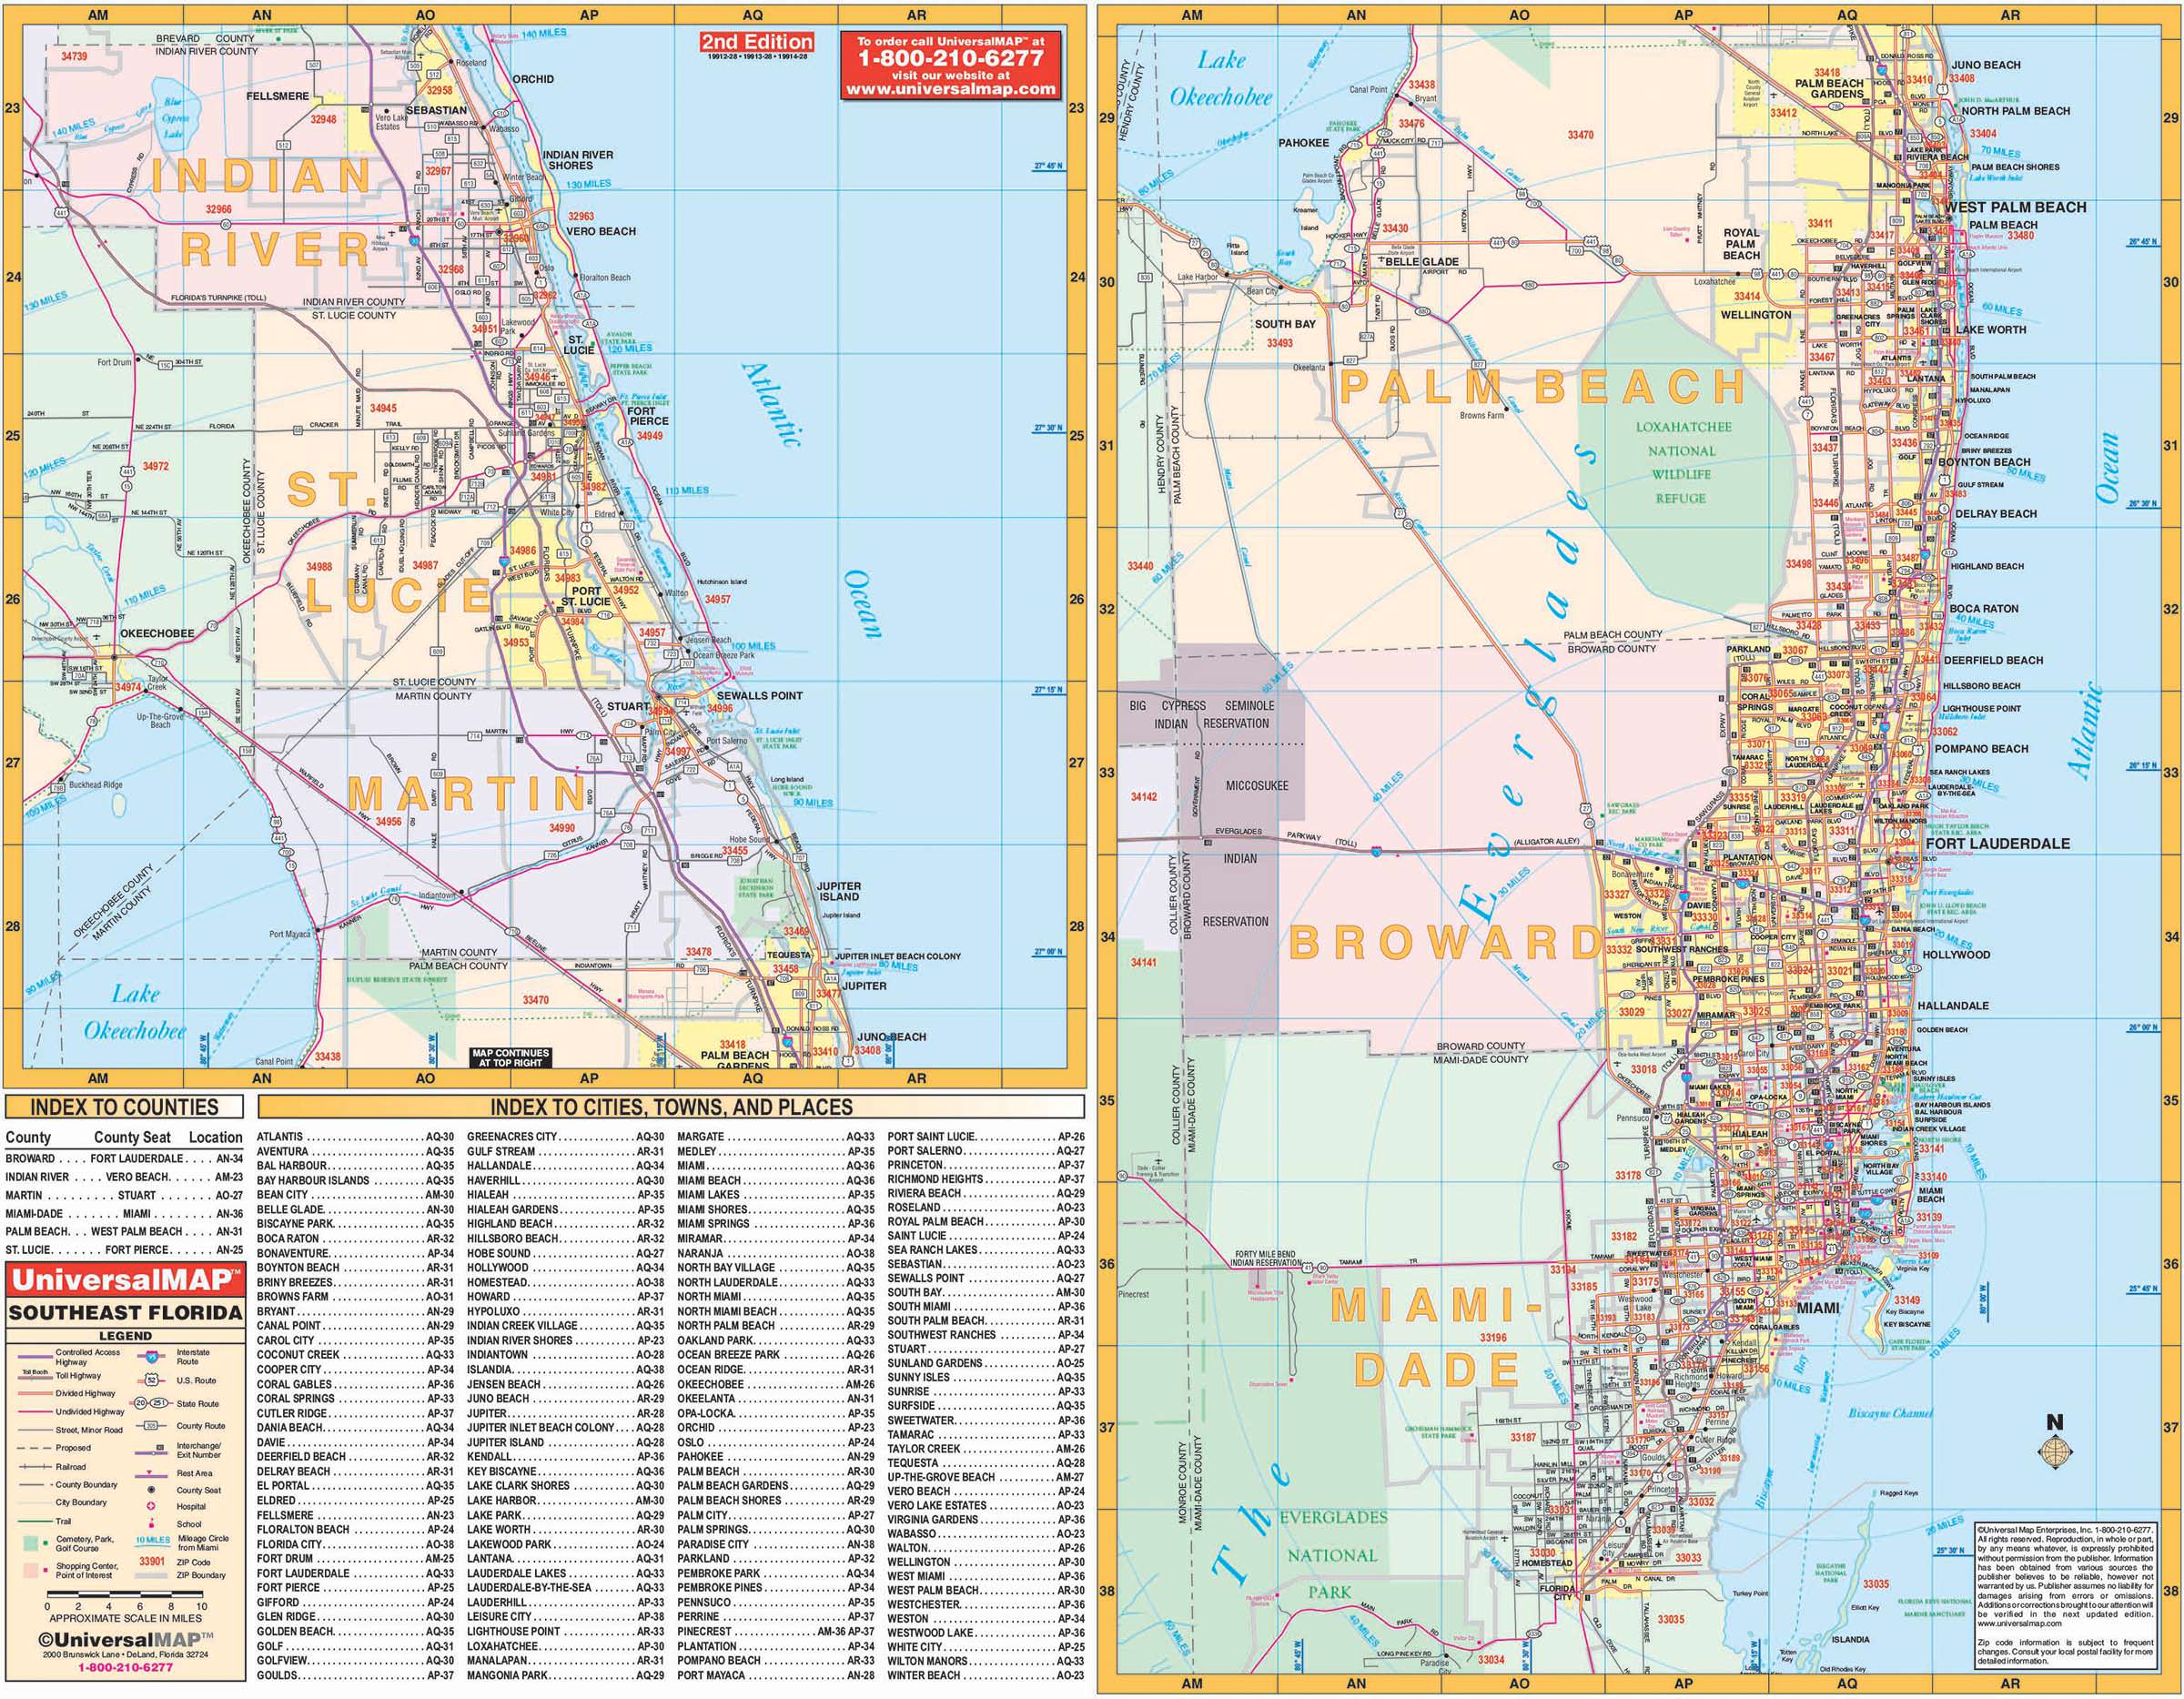 Florida State Southeast Regional Wall Map – Kappa Map Group - Florida Wall Maps For Sale